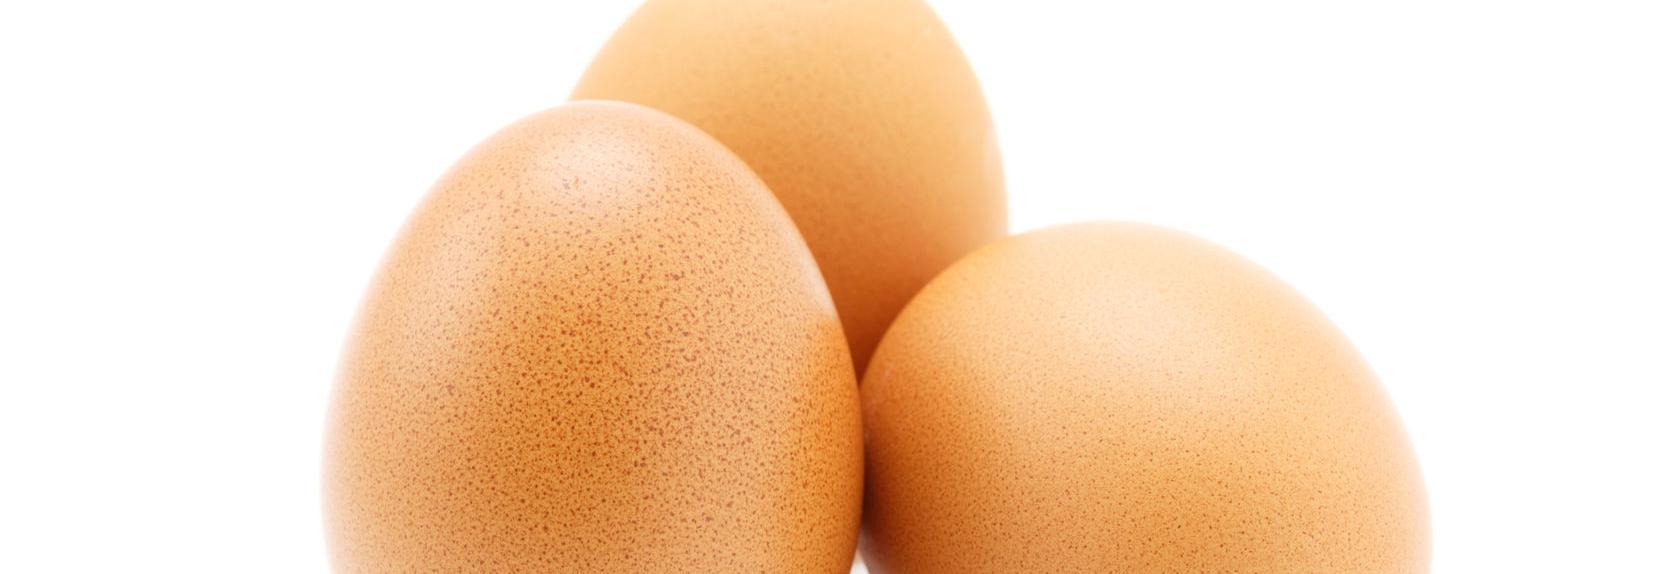 U.S. Egg banner Scottsdale, AZ